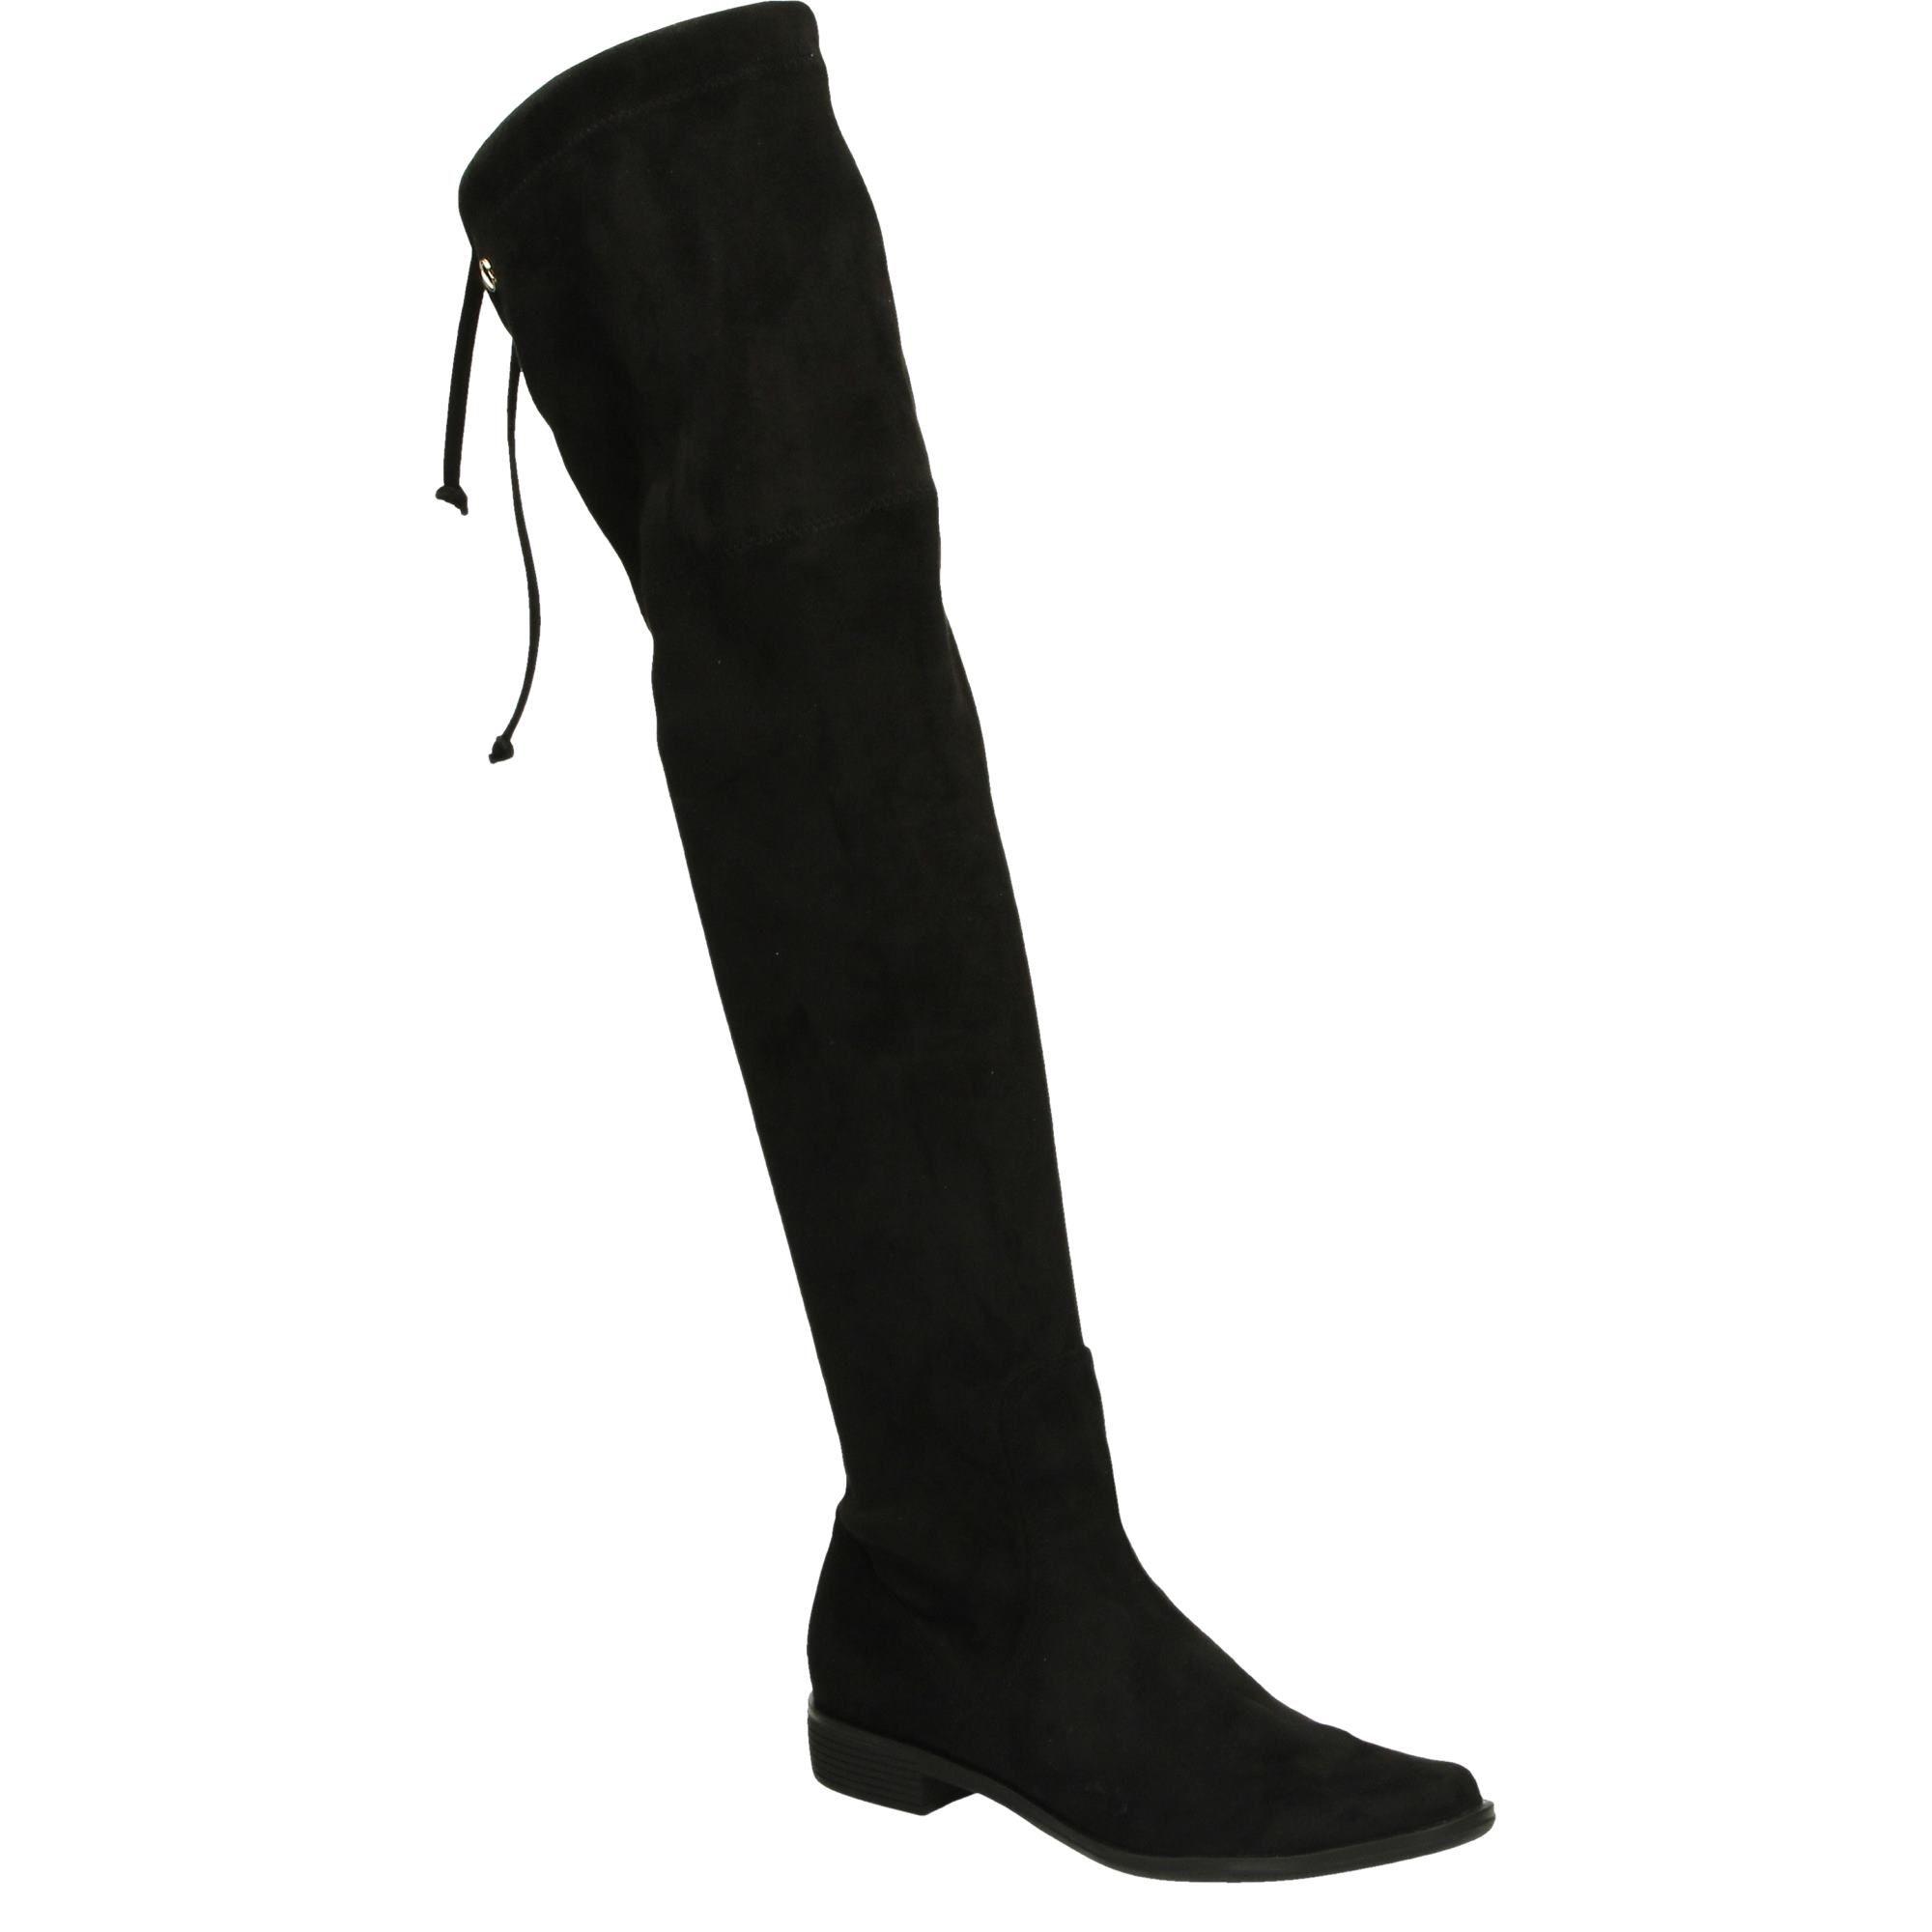 Kozaki Knee Boots Boots Over Knee Boot